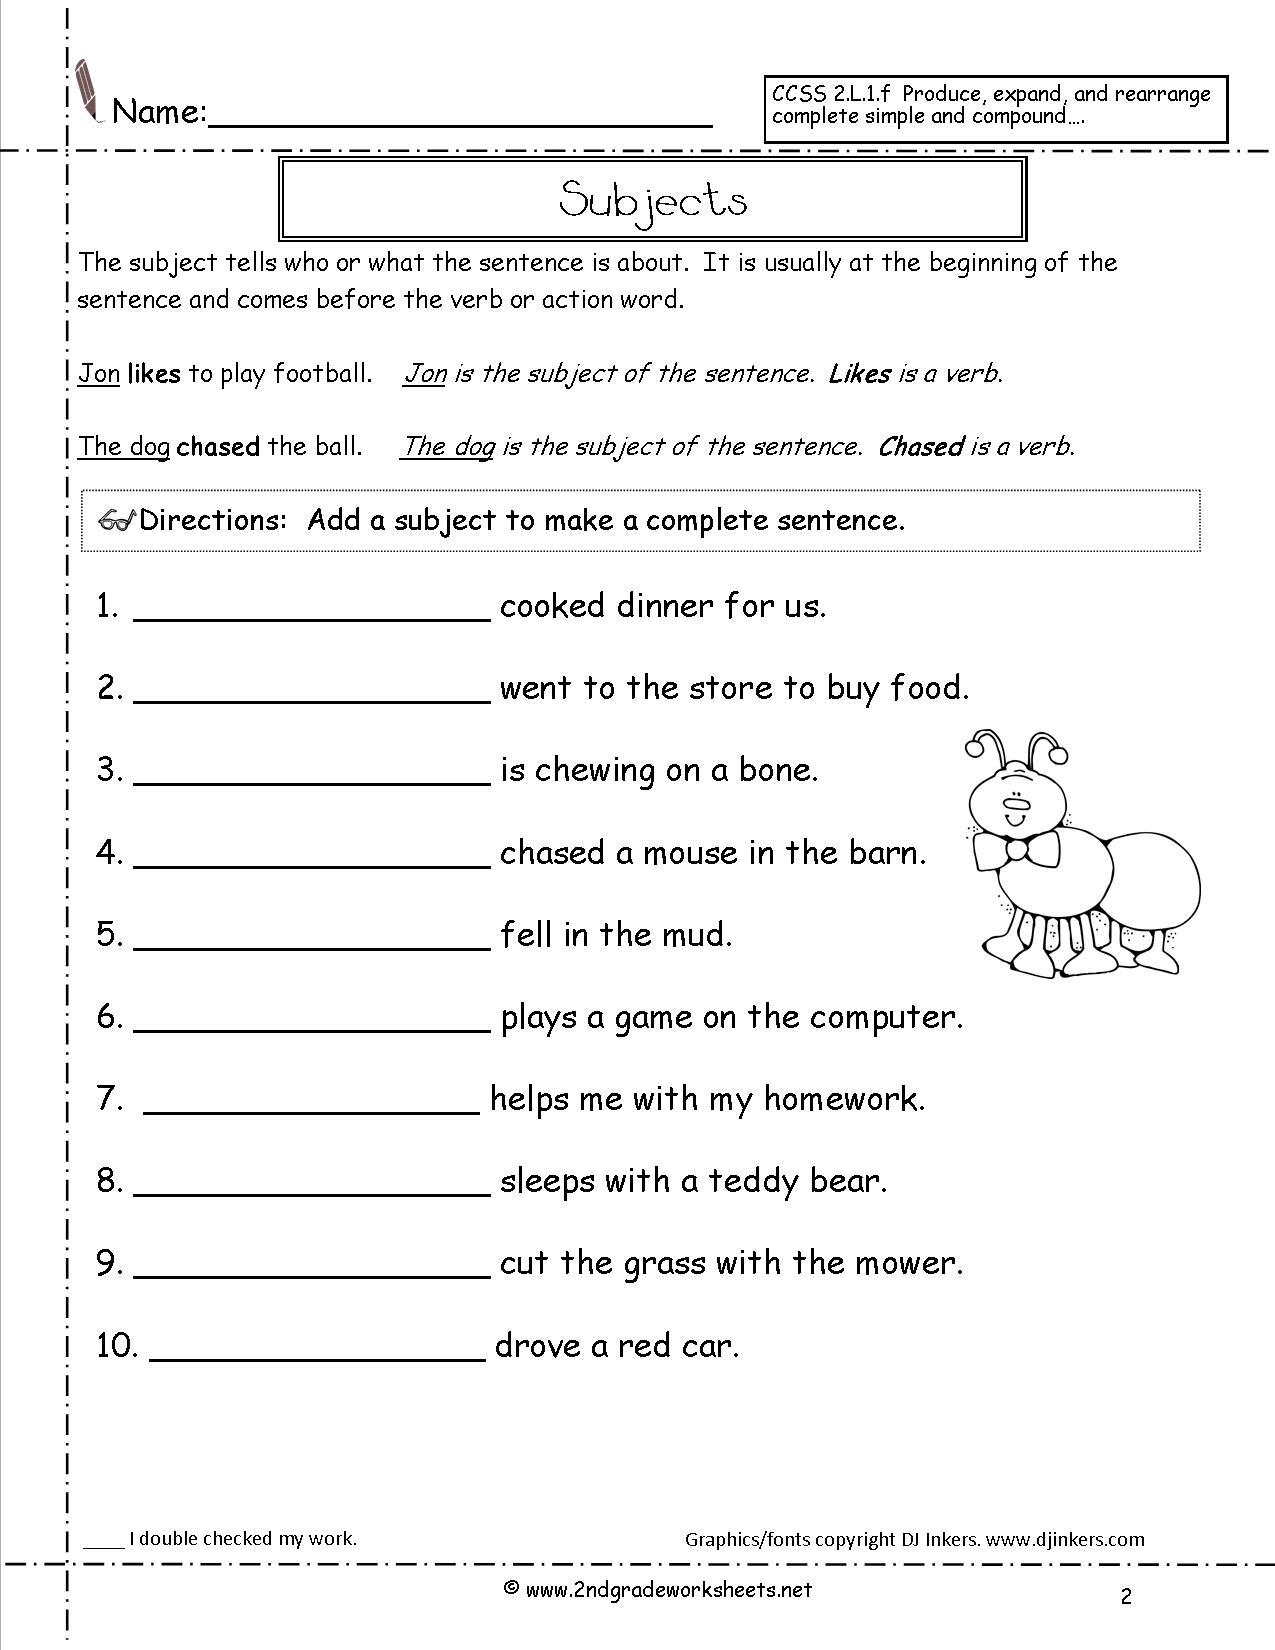 Second Grade Sentences Worksheets, Ccss 2.l.1.f Worksheets. | Free Printable Subject Predicate Worksheets 2Nd Grade